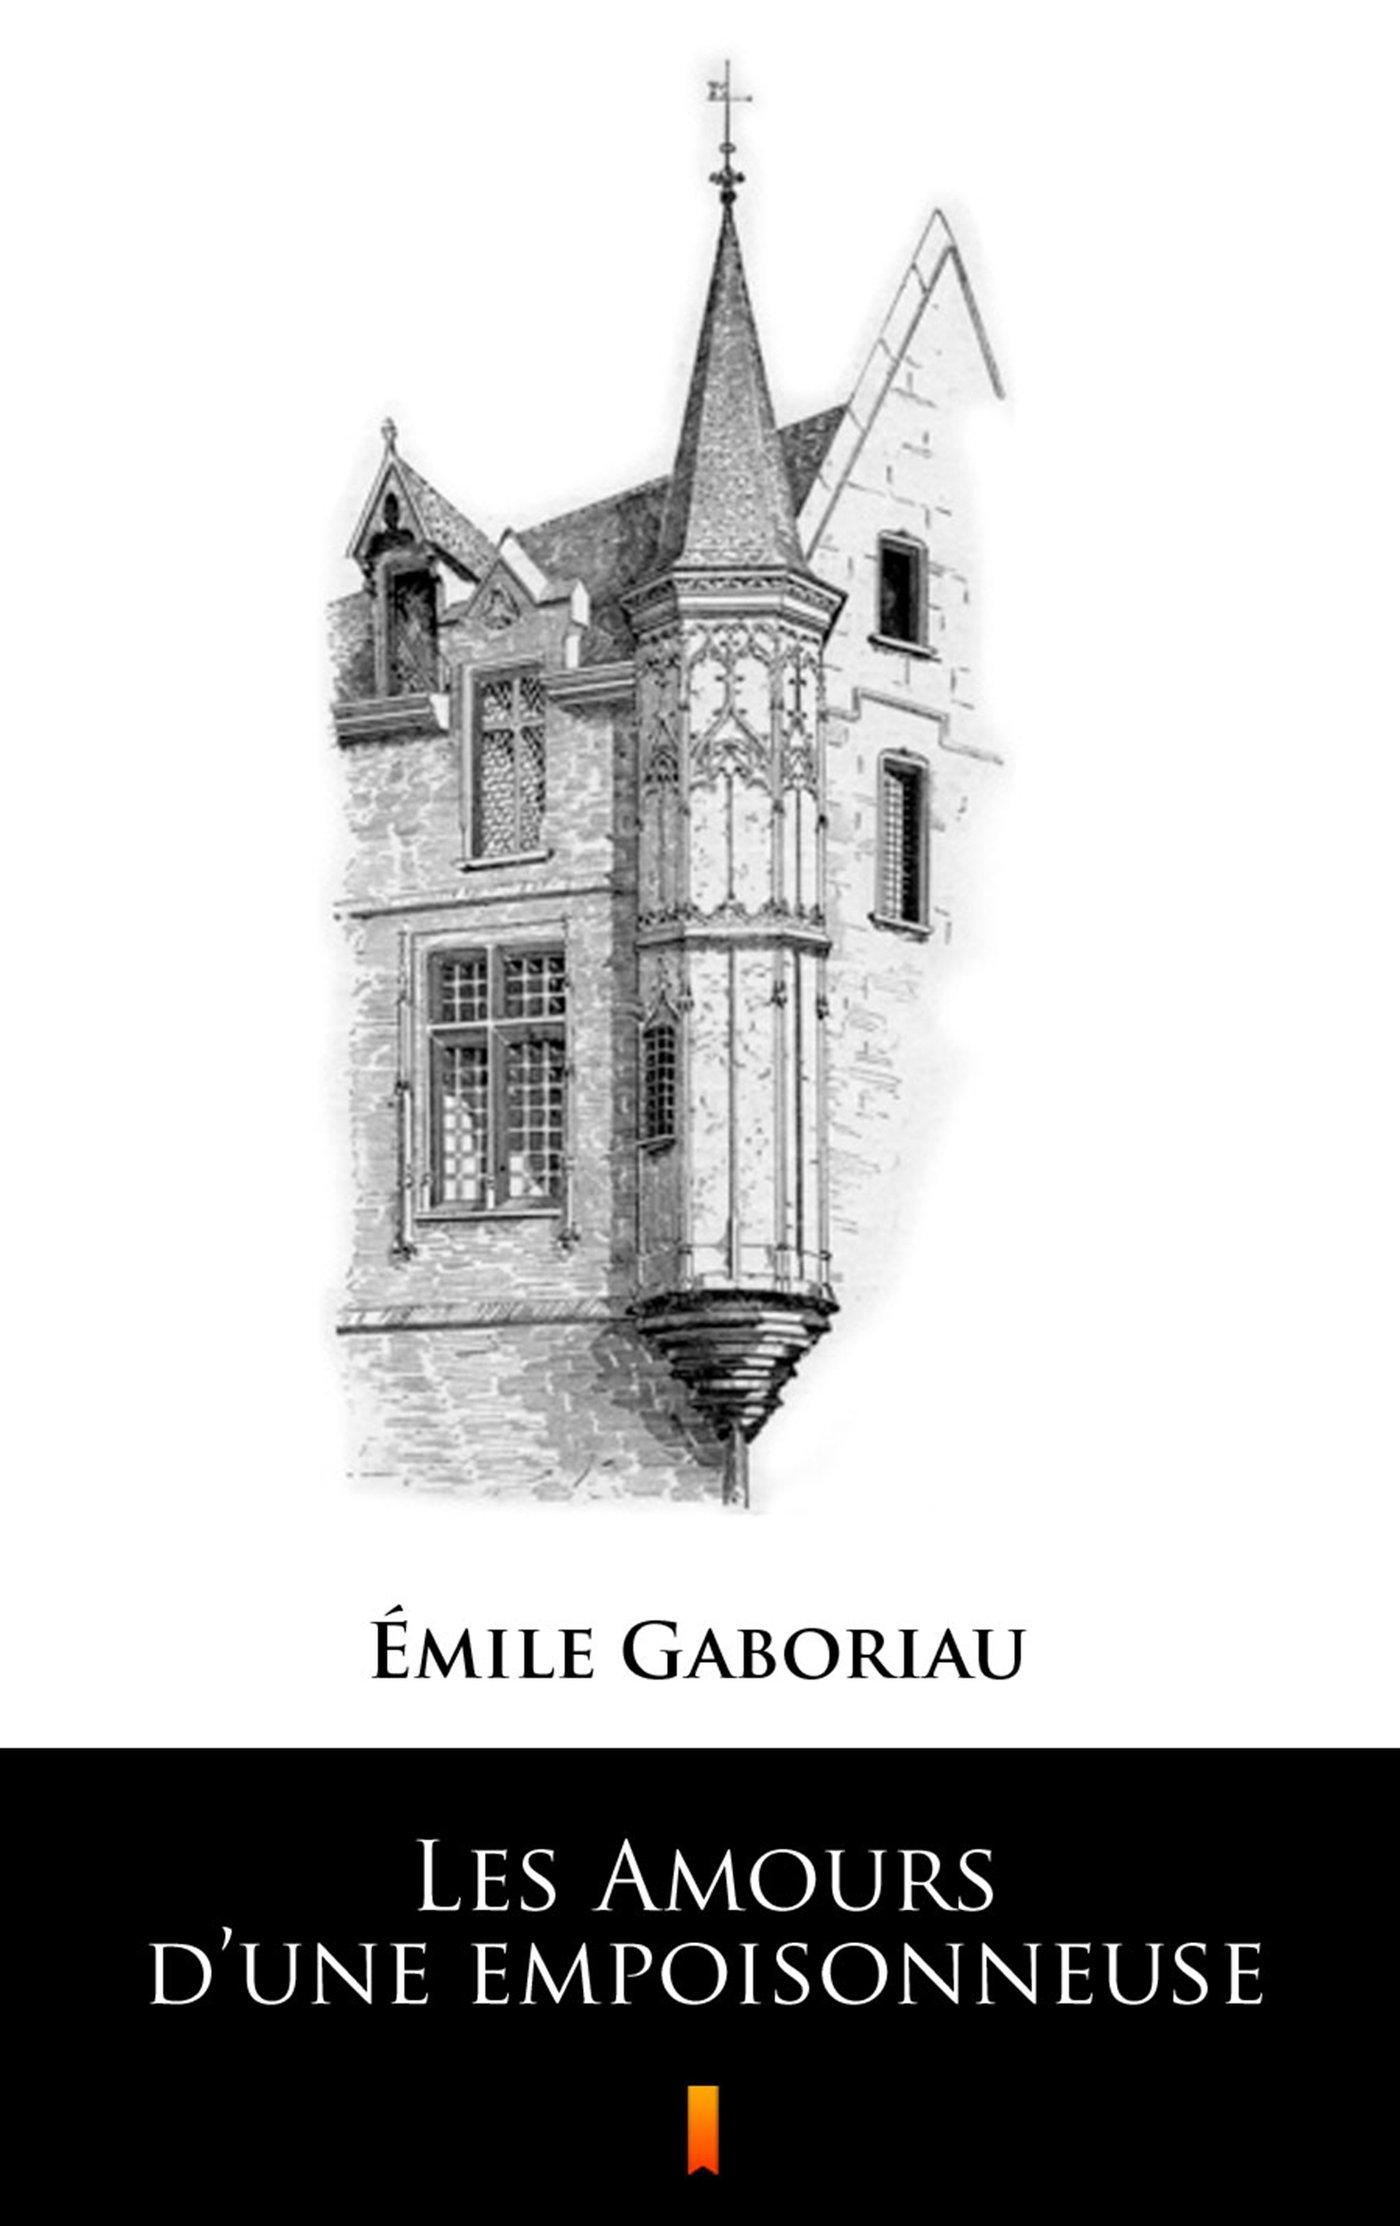 Les Amours d'une empoisonneuse - Ebook (Książka na Kindle) do pobrania w formacie MOBI